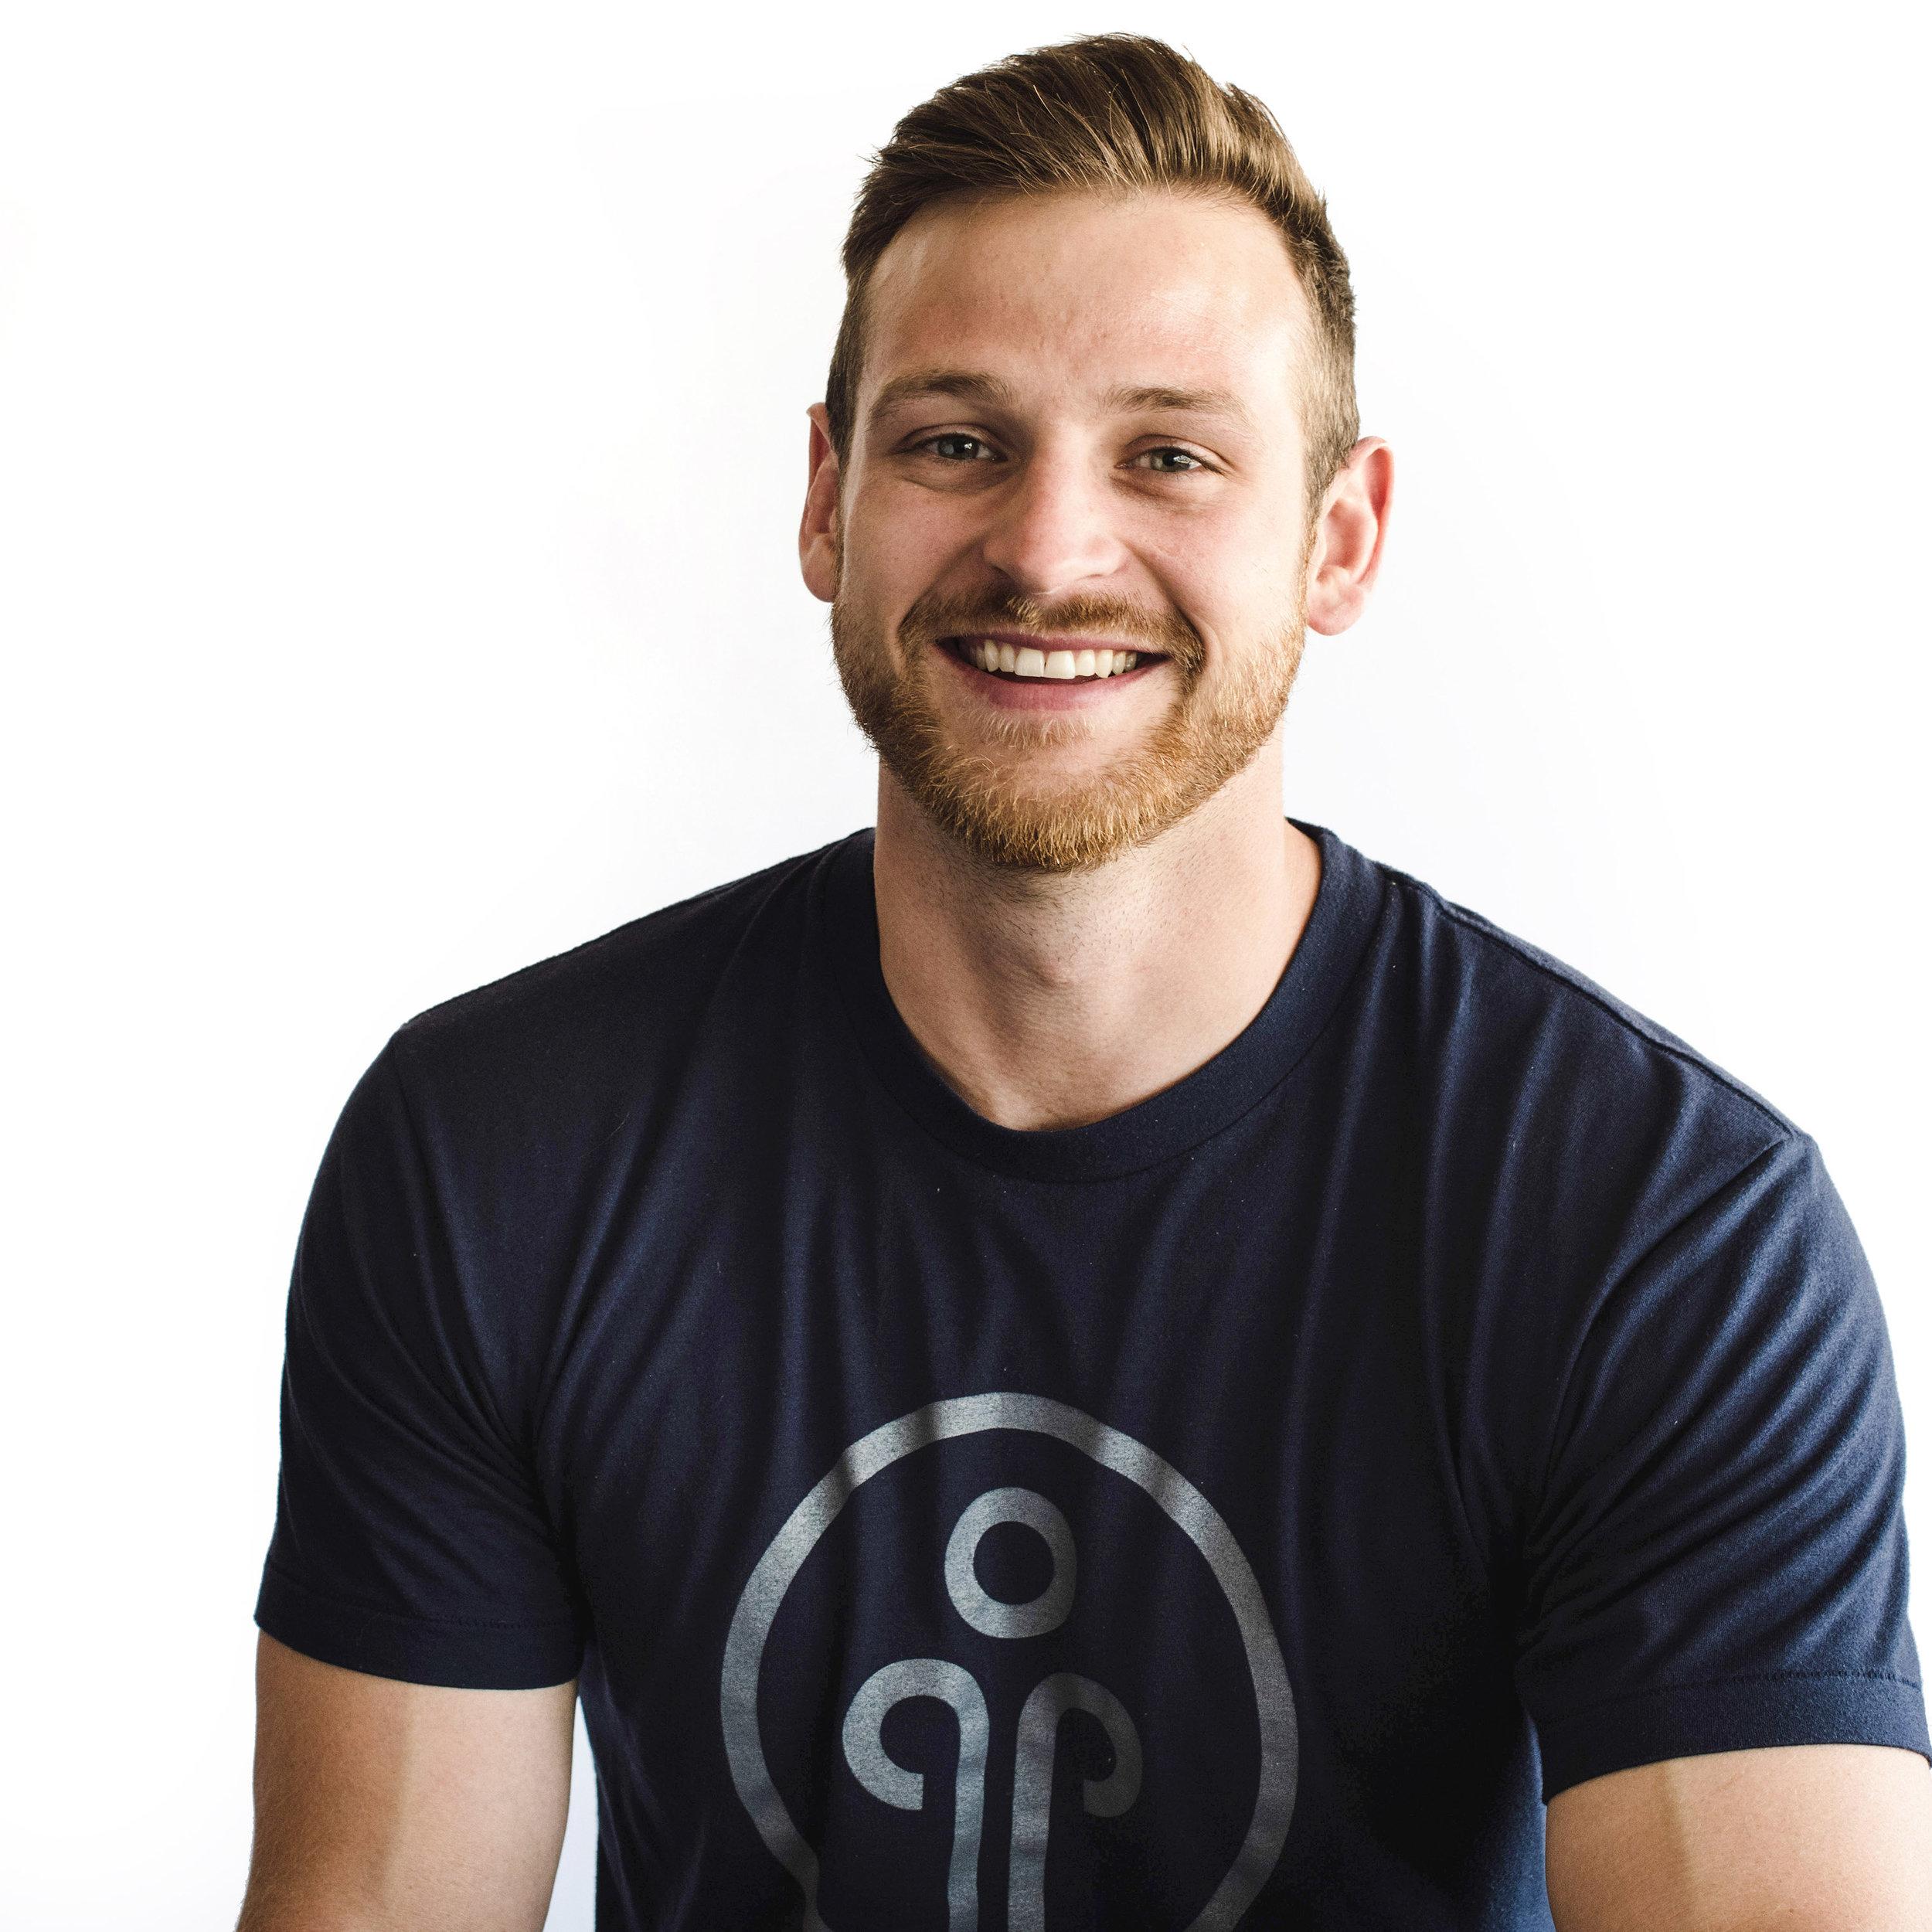 Andrew Middleton - Movement & Exercise Expert